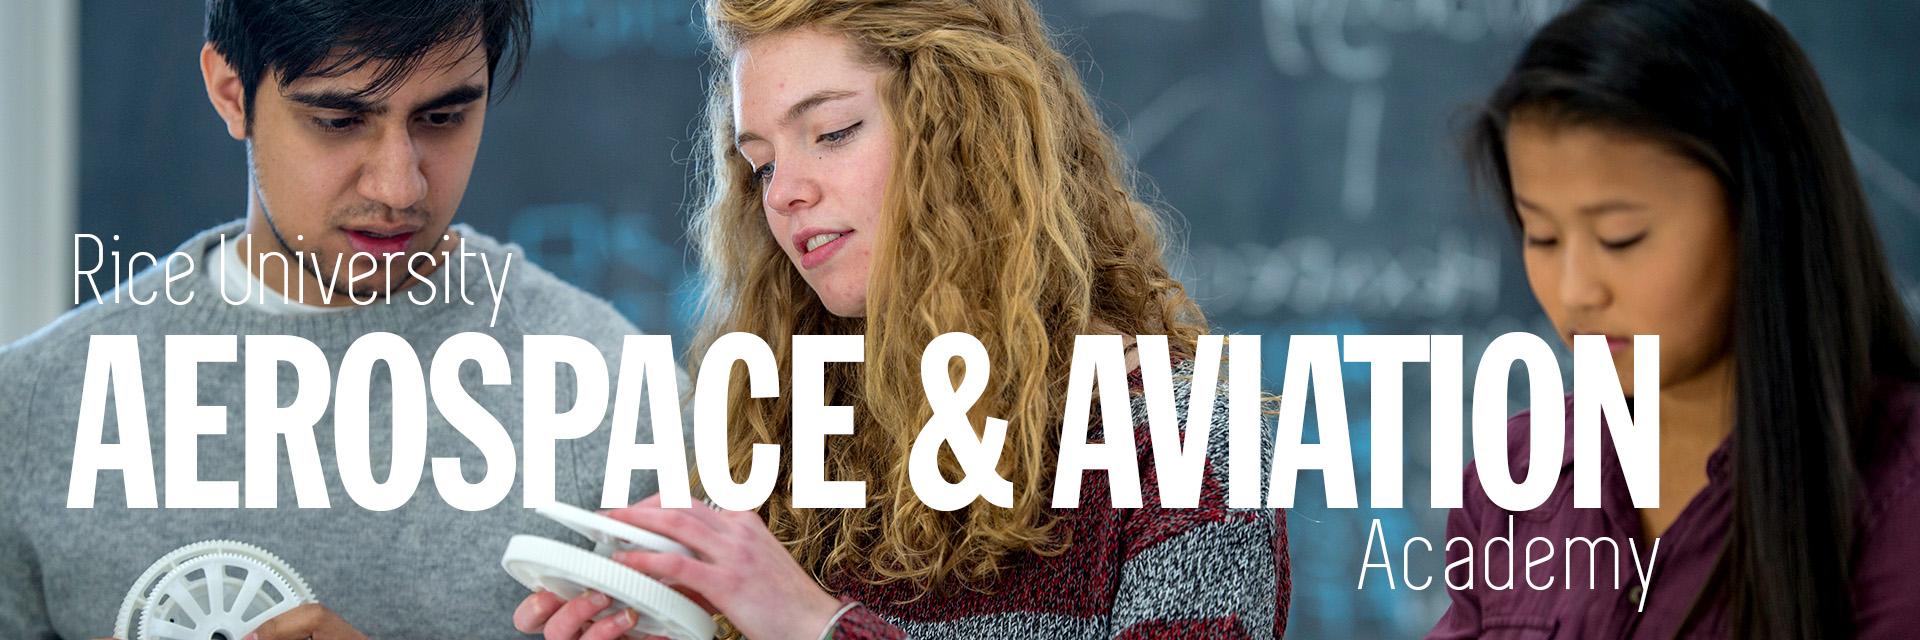 Rice University Aerospace & Aviation Academy | High School Summer